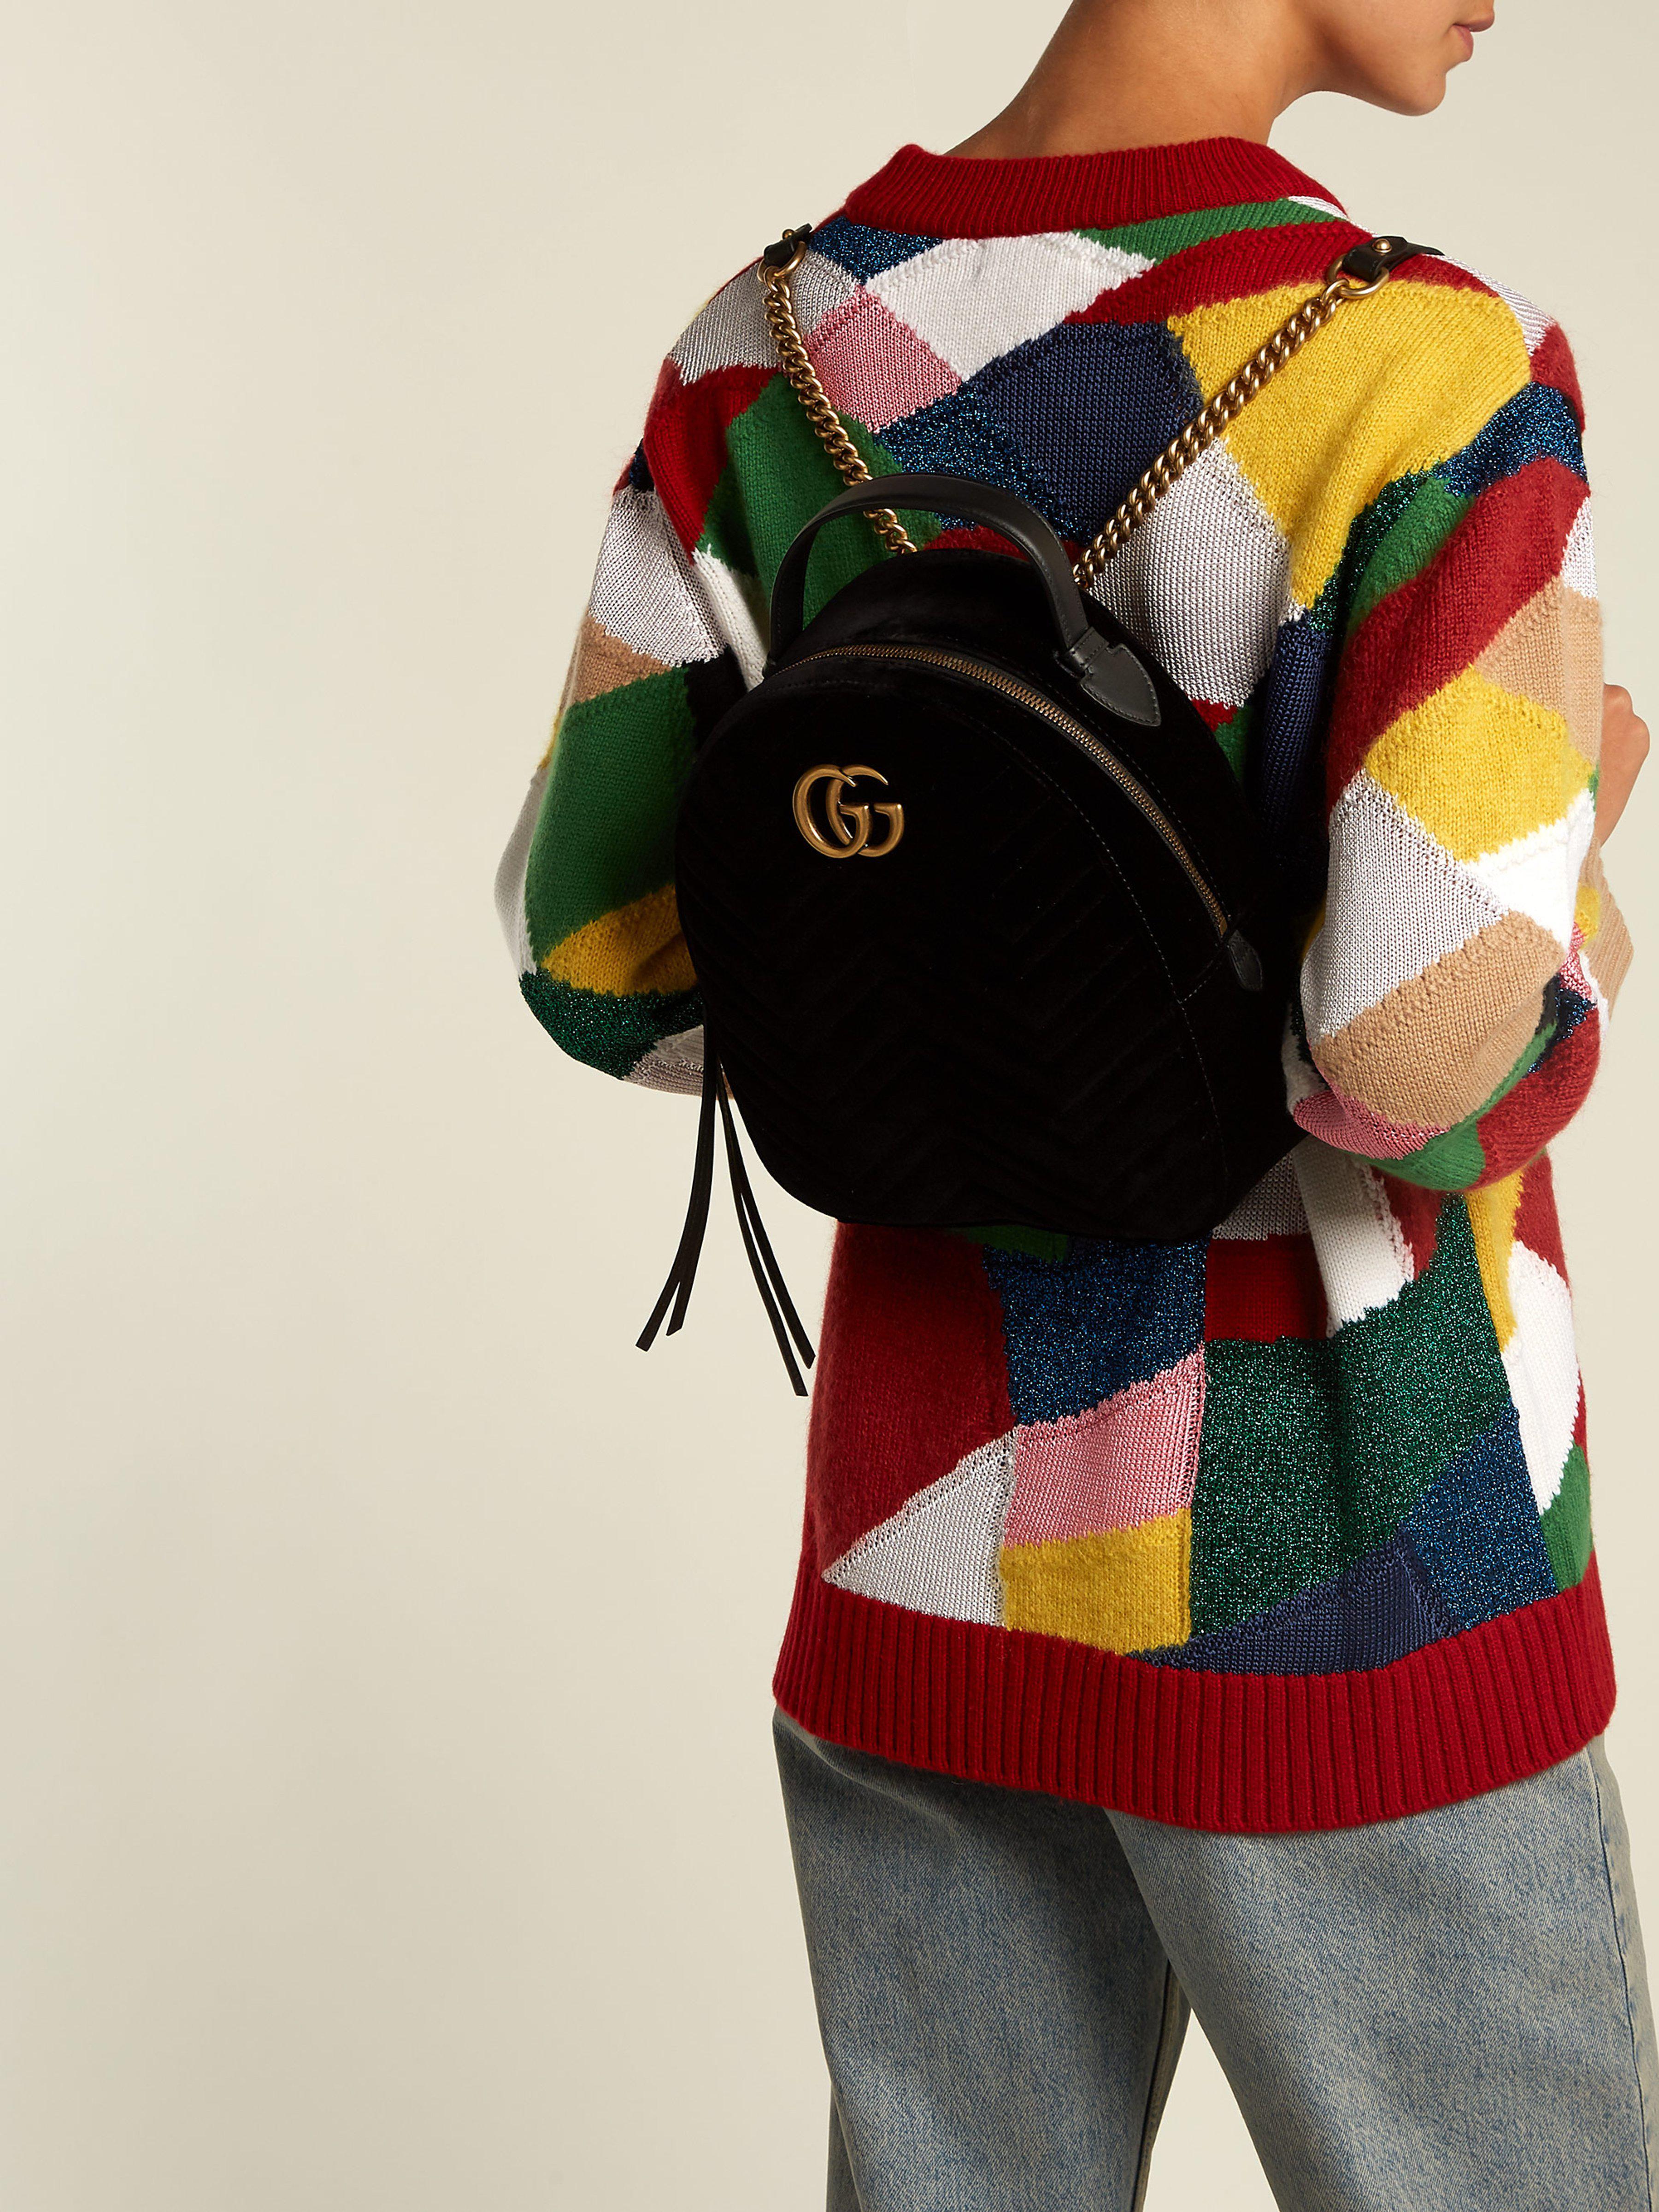 184281456d21 Gucci Gg Marmont Velvet Backpack in Black - Lyst